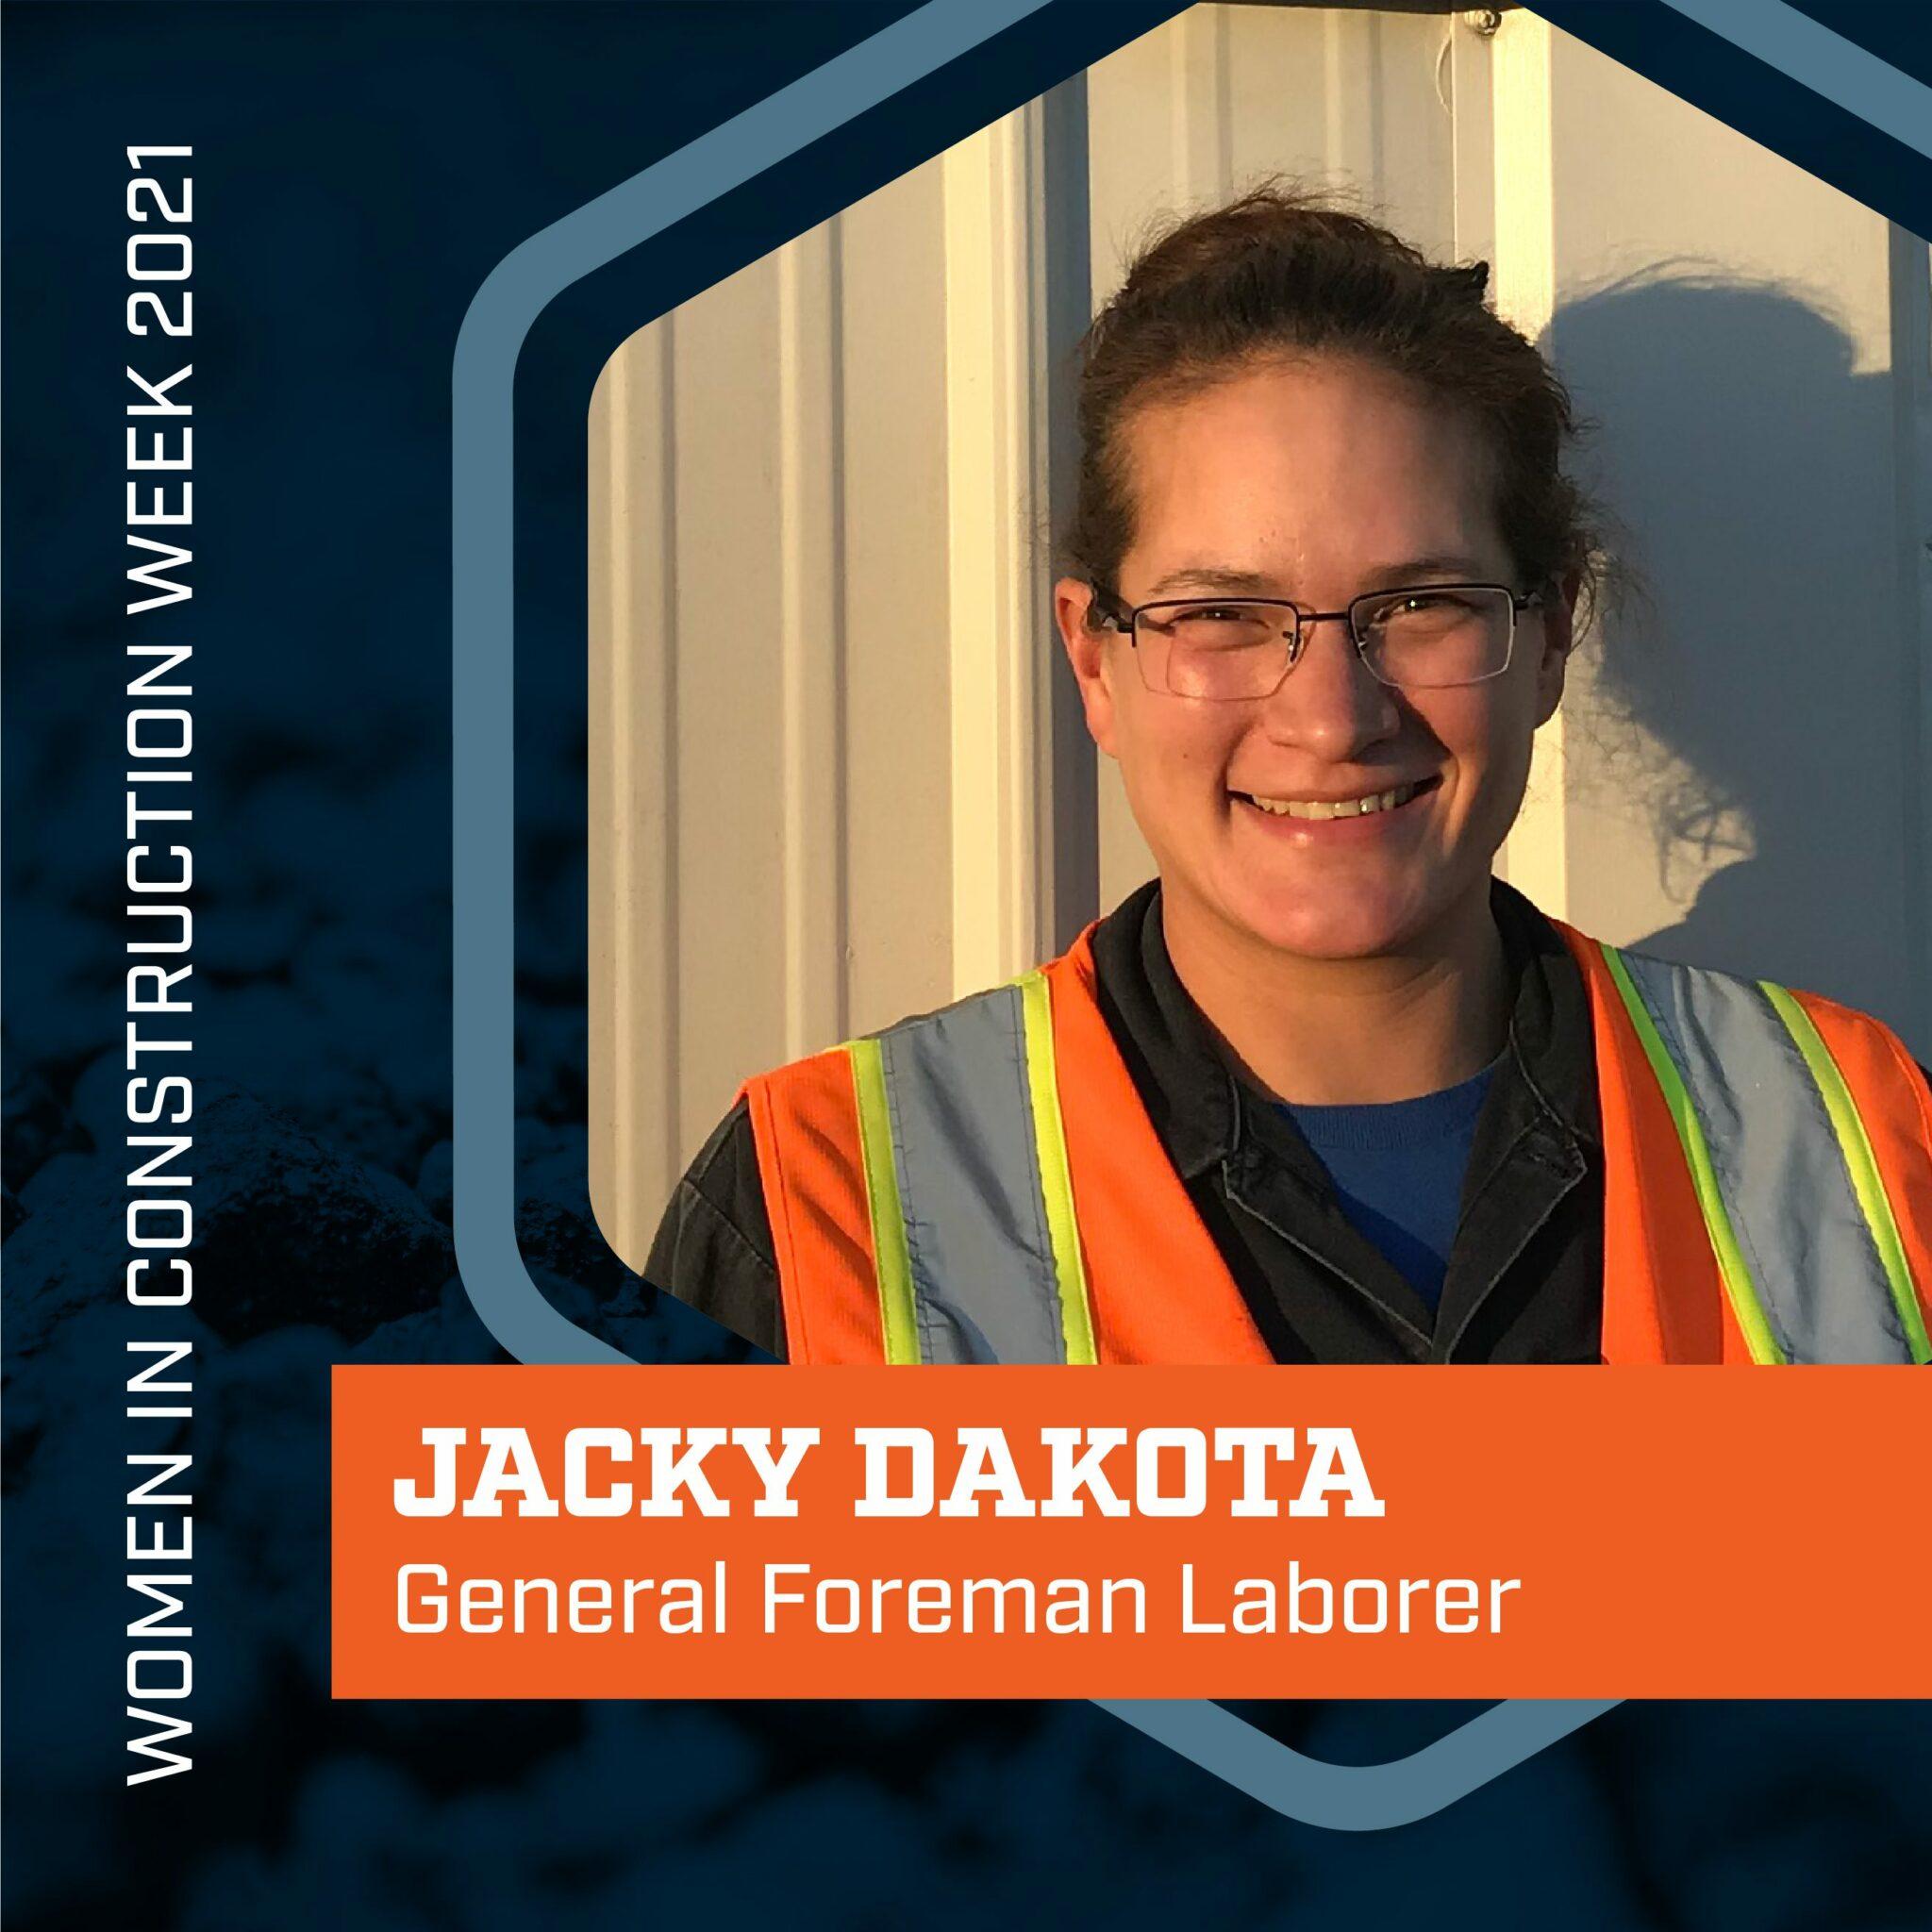 Jacky Dakota WIC Week